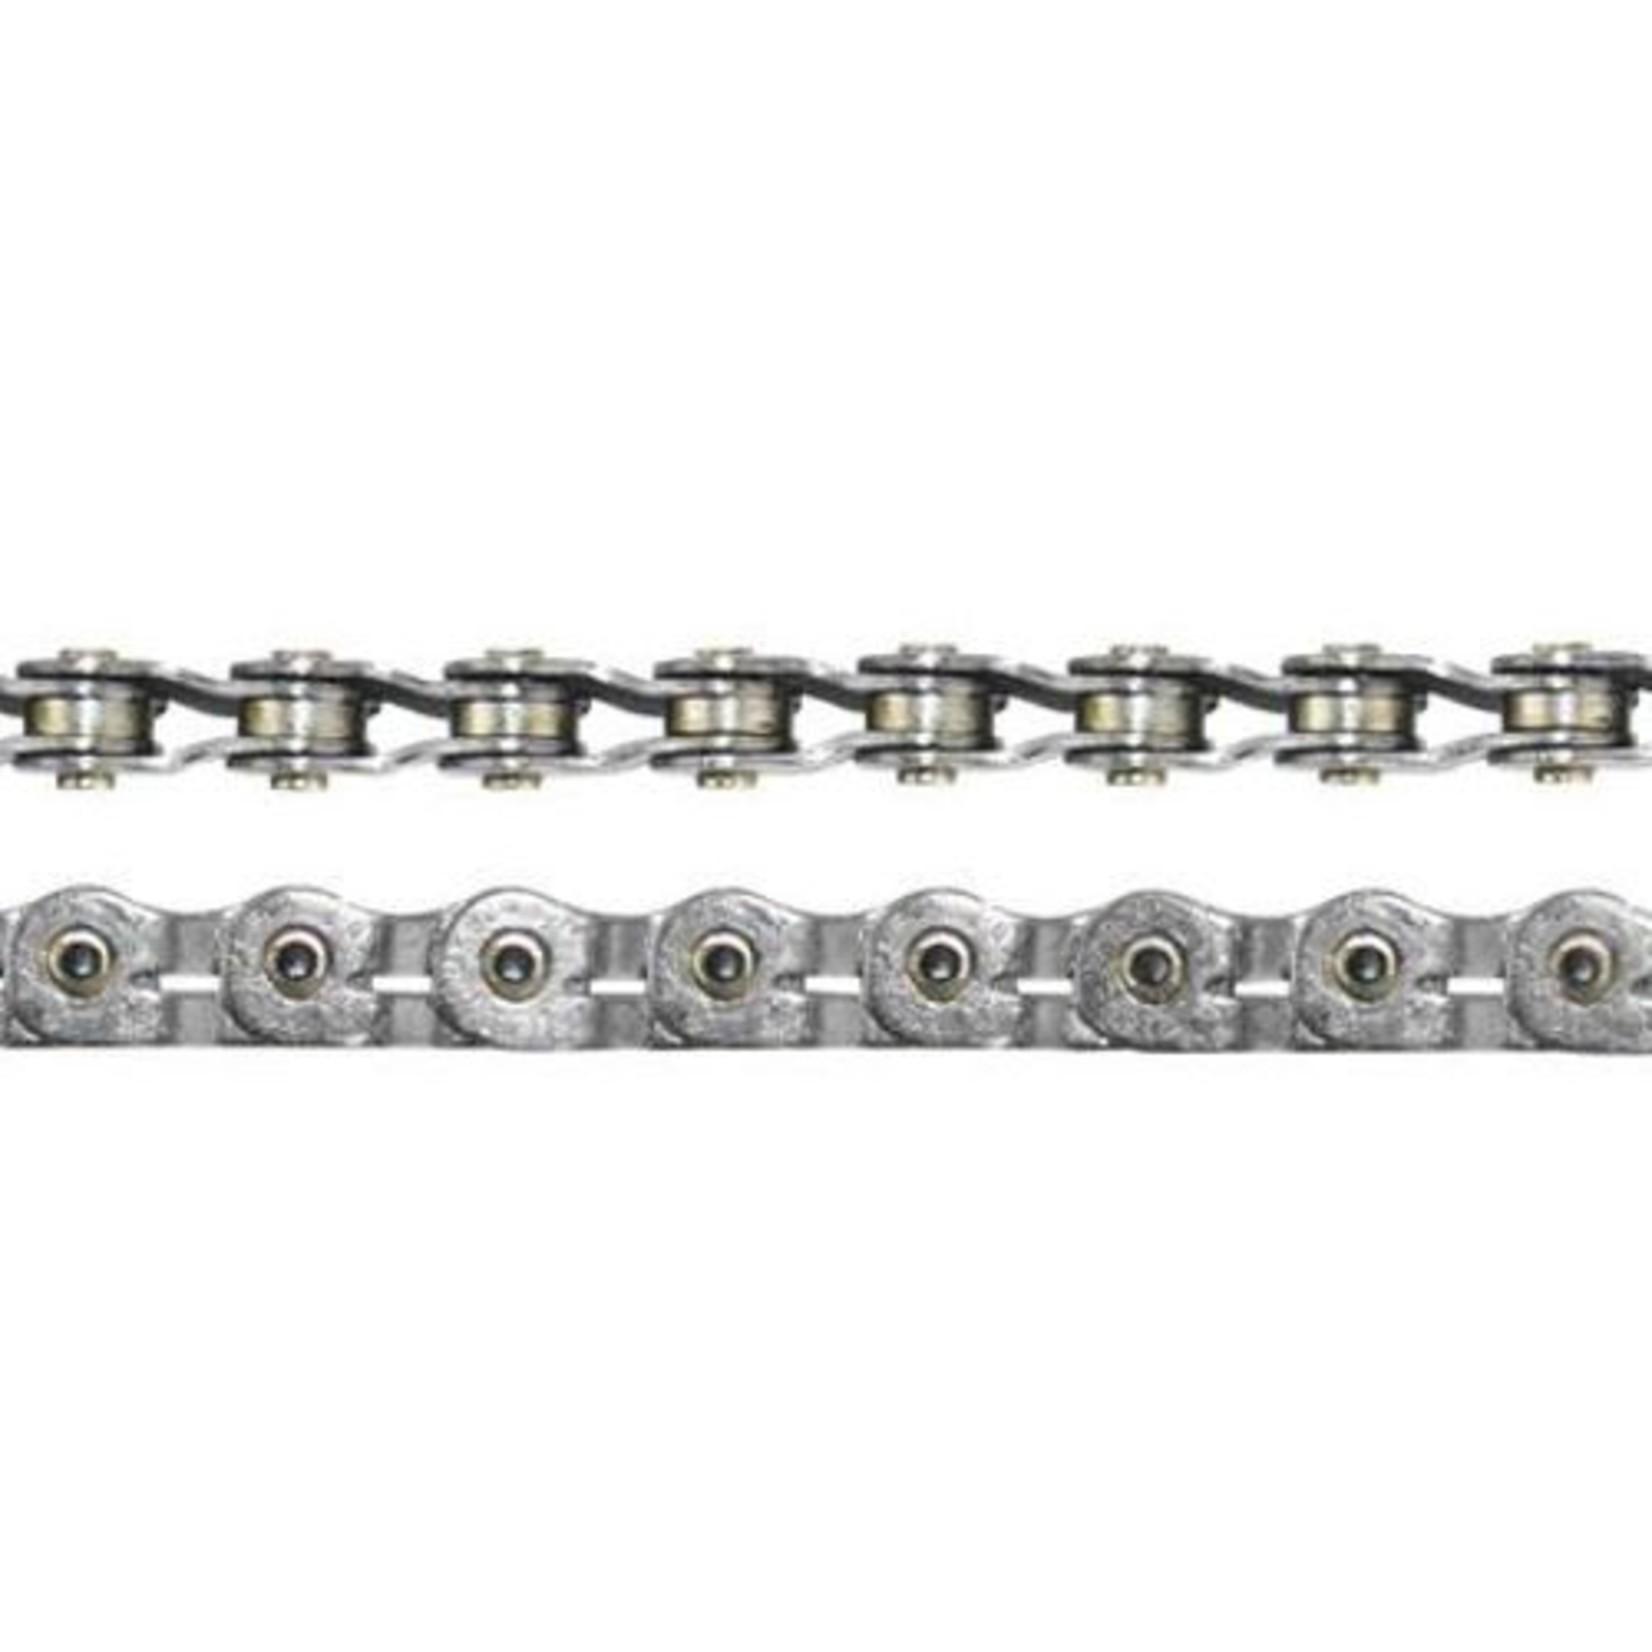 "Crupi Crupi Rhythm Chain Half Link  3/32"" Hollow Pin"